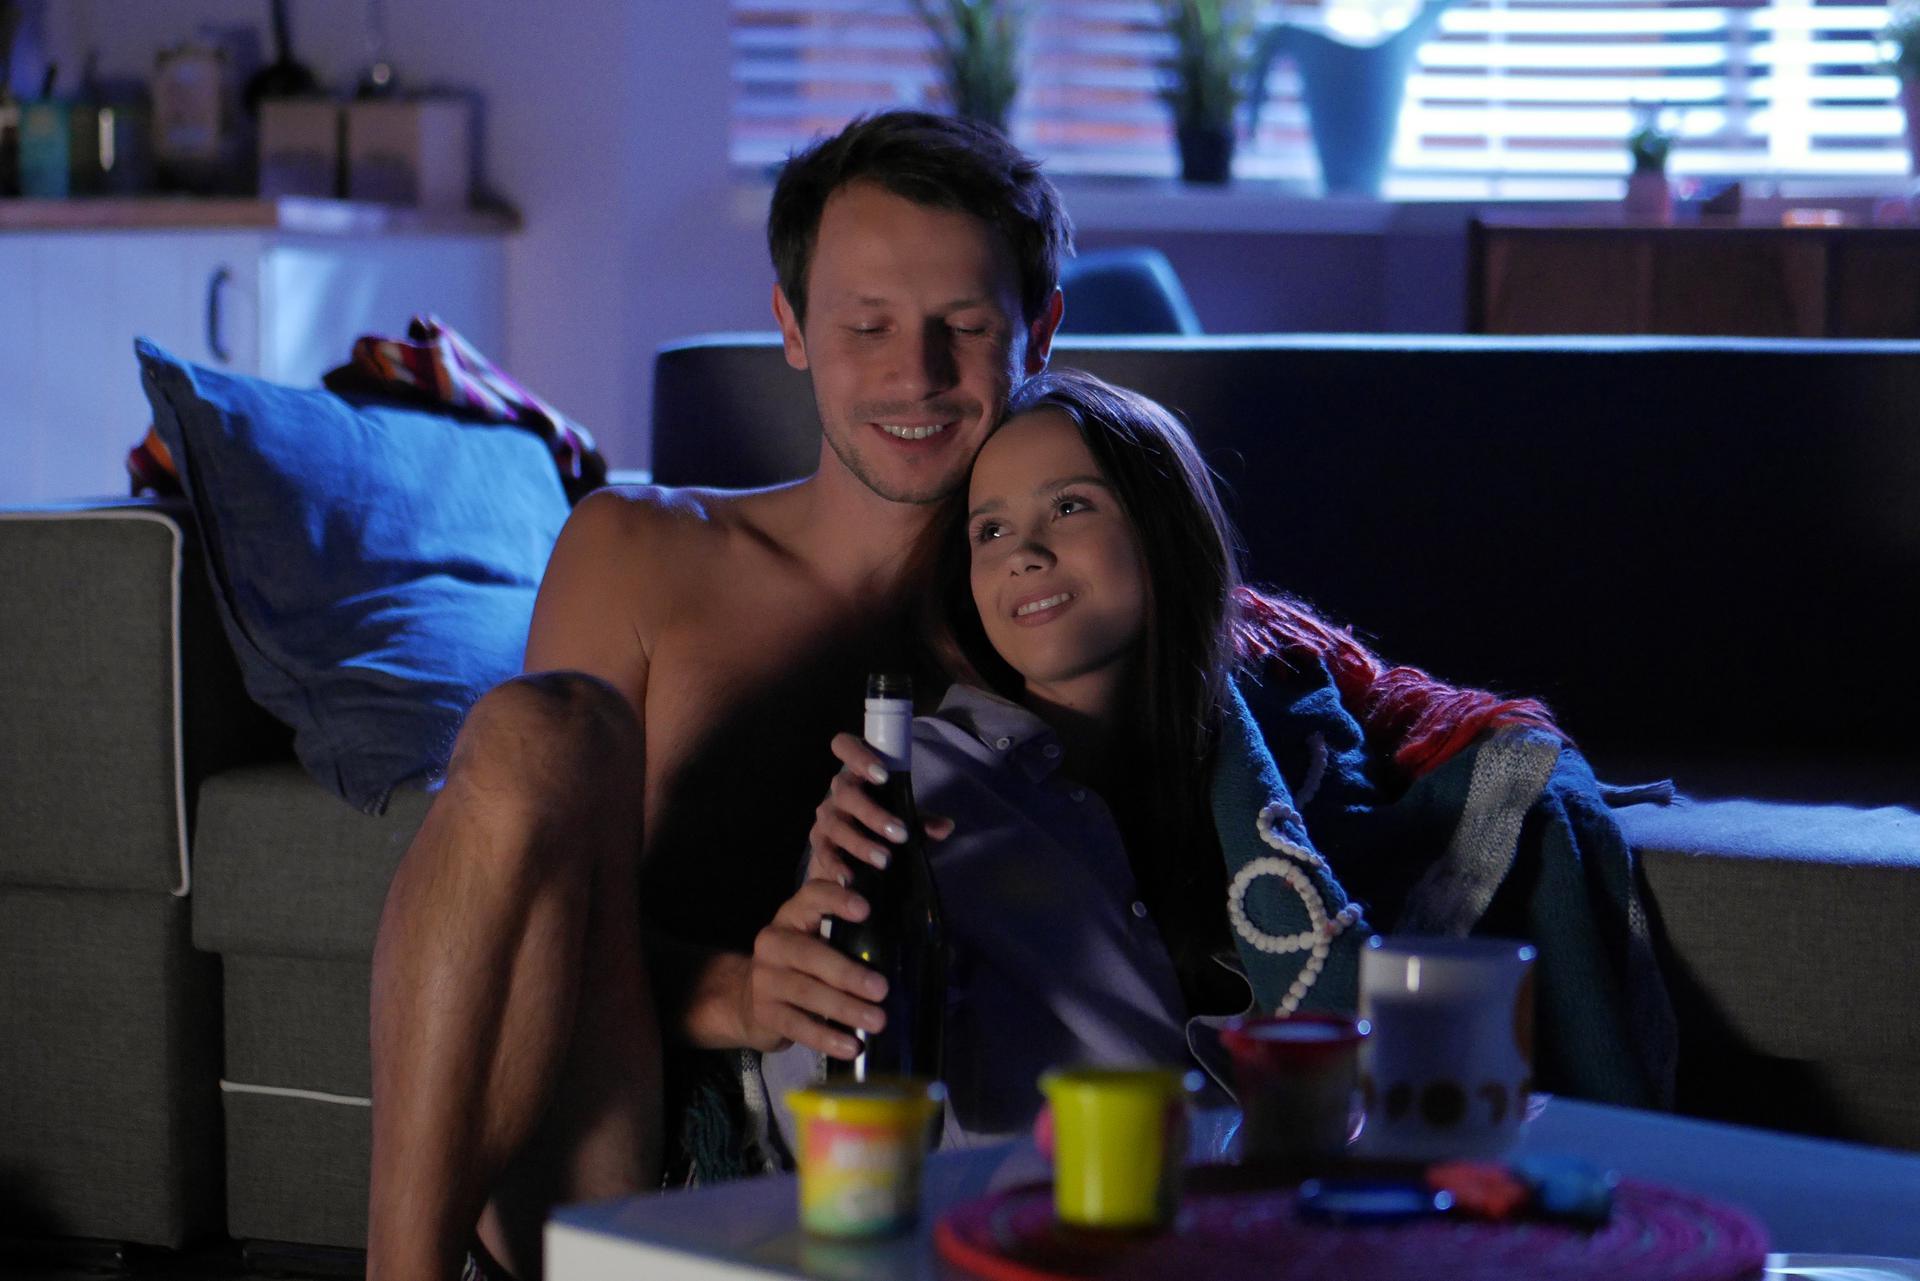 tęsknię za nastolatką USA seks college kurwa imprezy porno